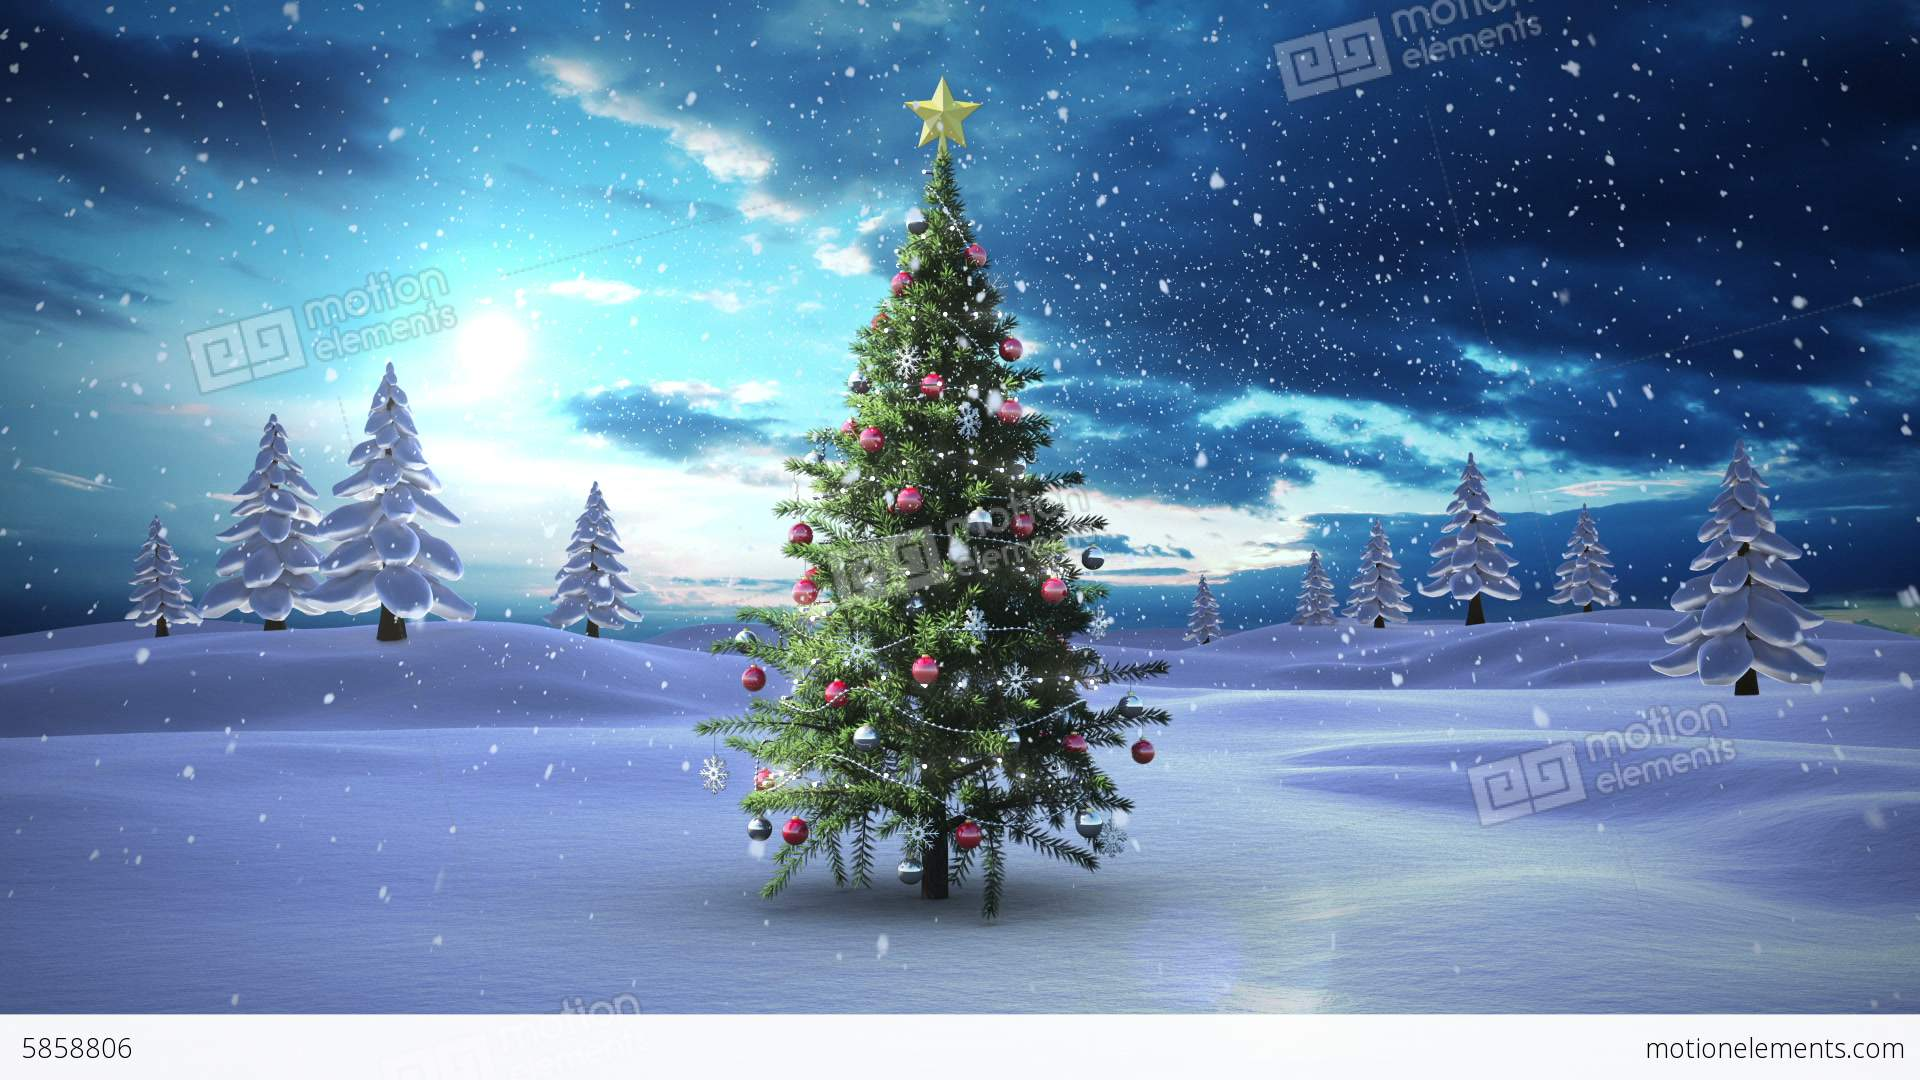 Snow Falling Christmas Tree In Snowy Landscape Stock ...